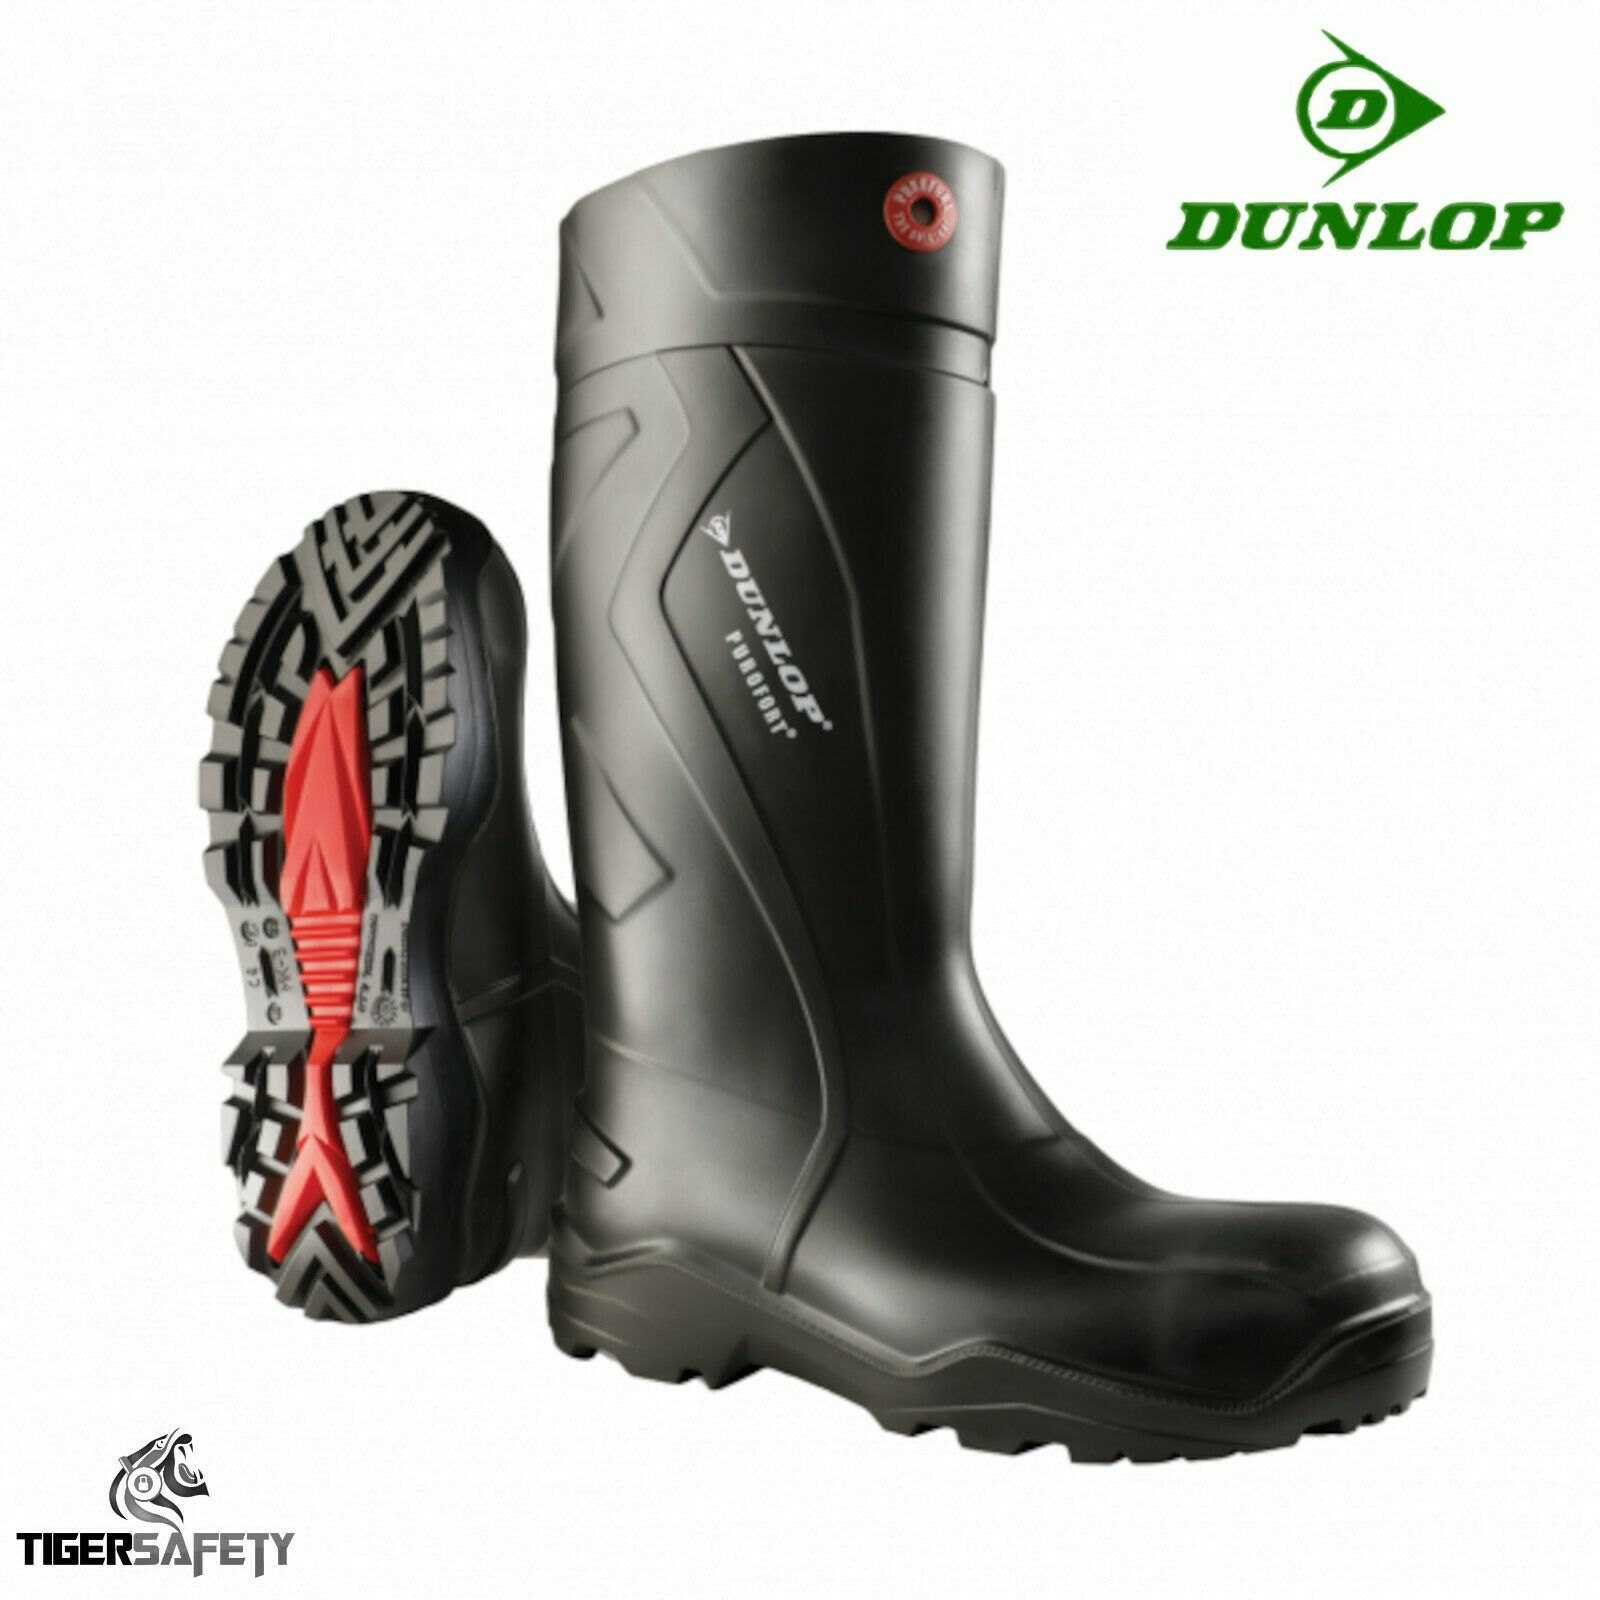 Dunlop Purofort + full safety s5 Insulated Black foamed PU light boots